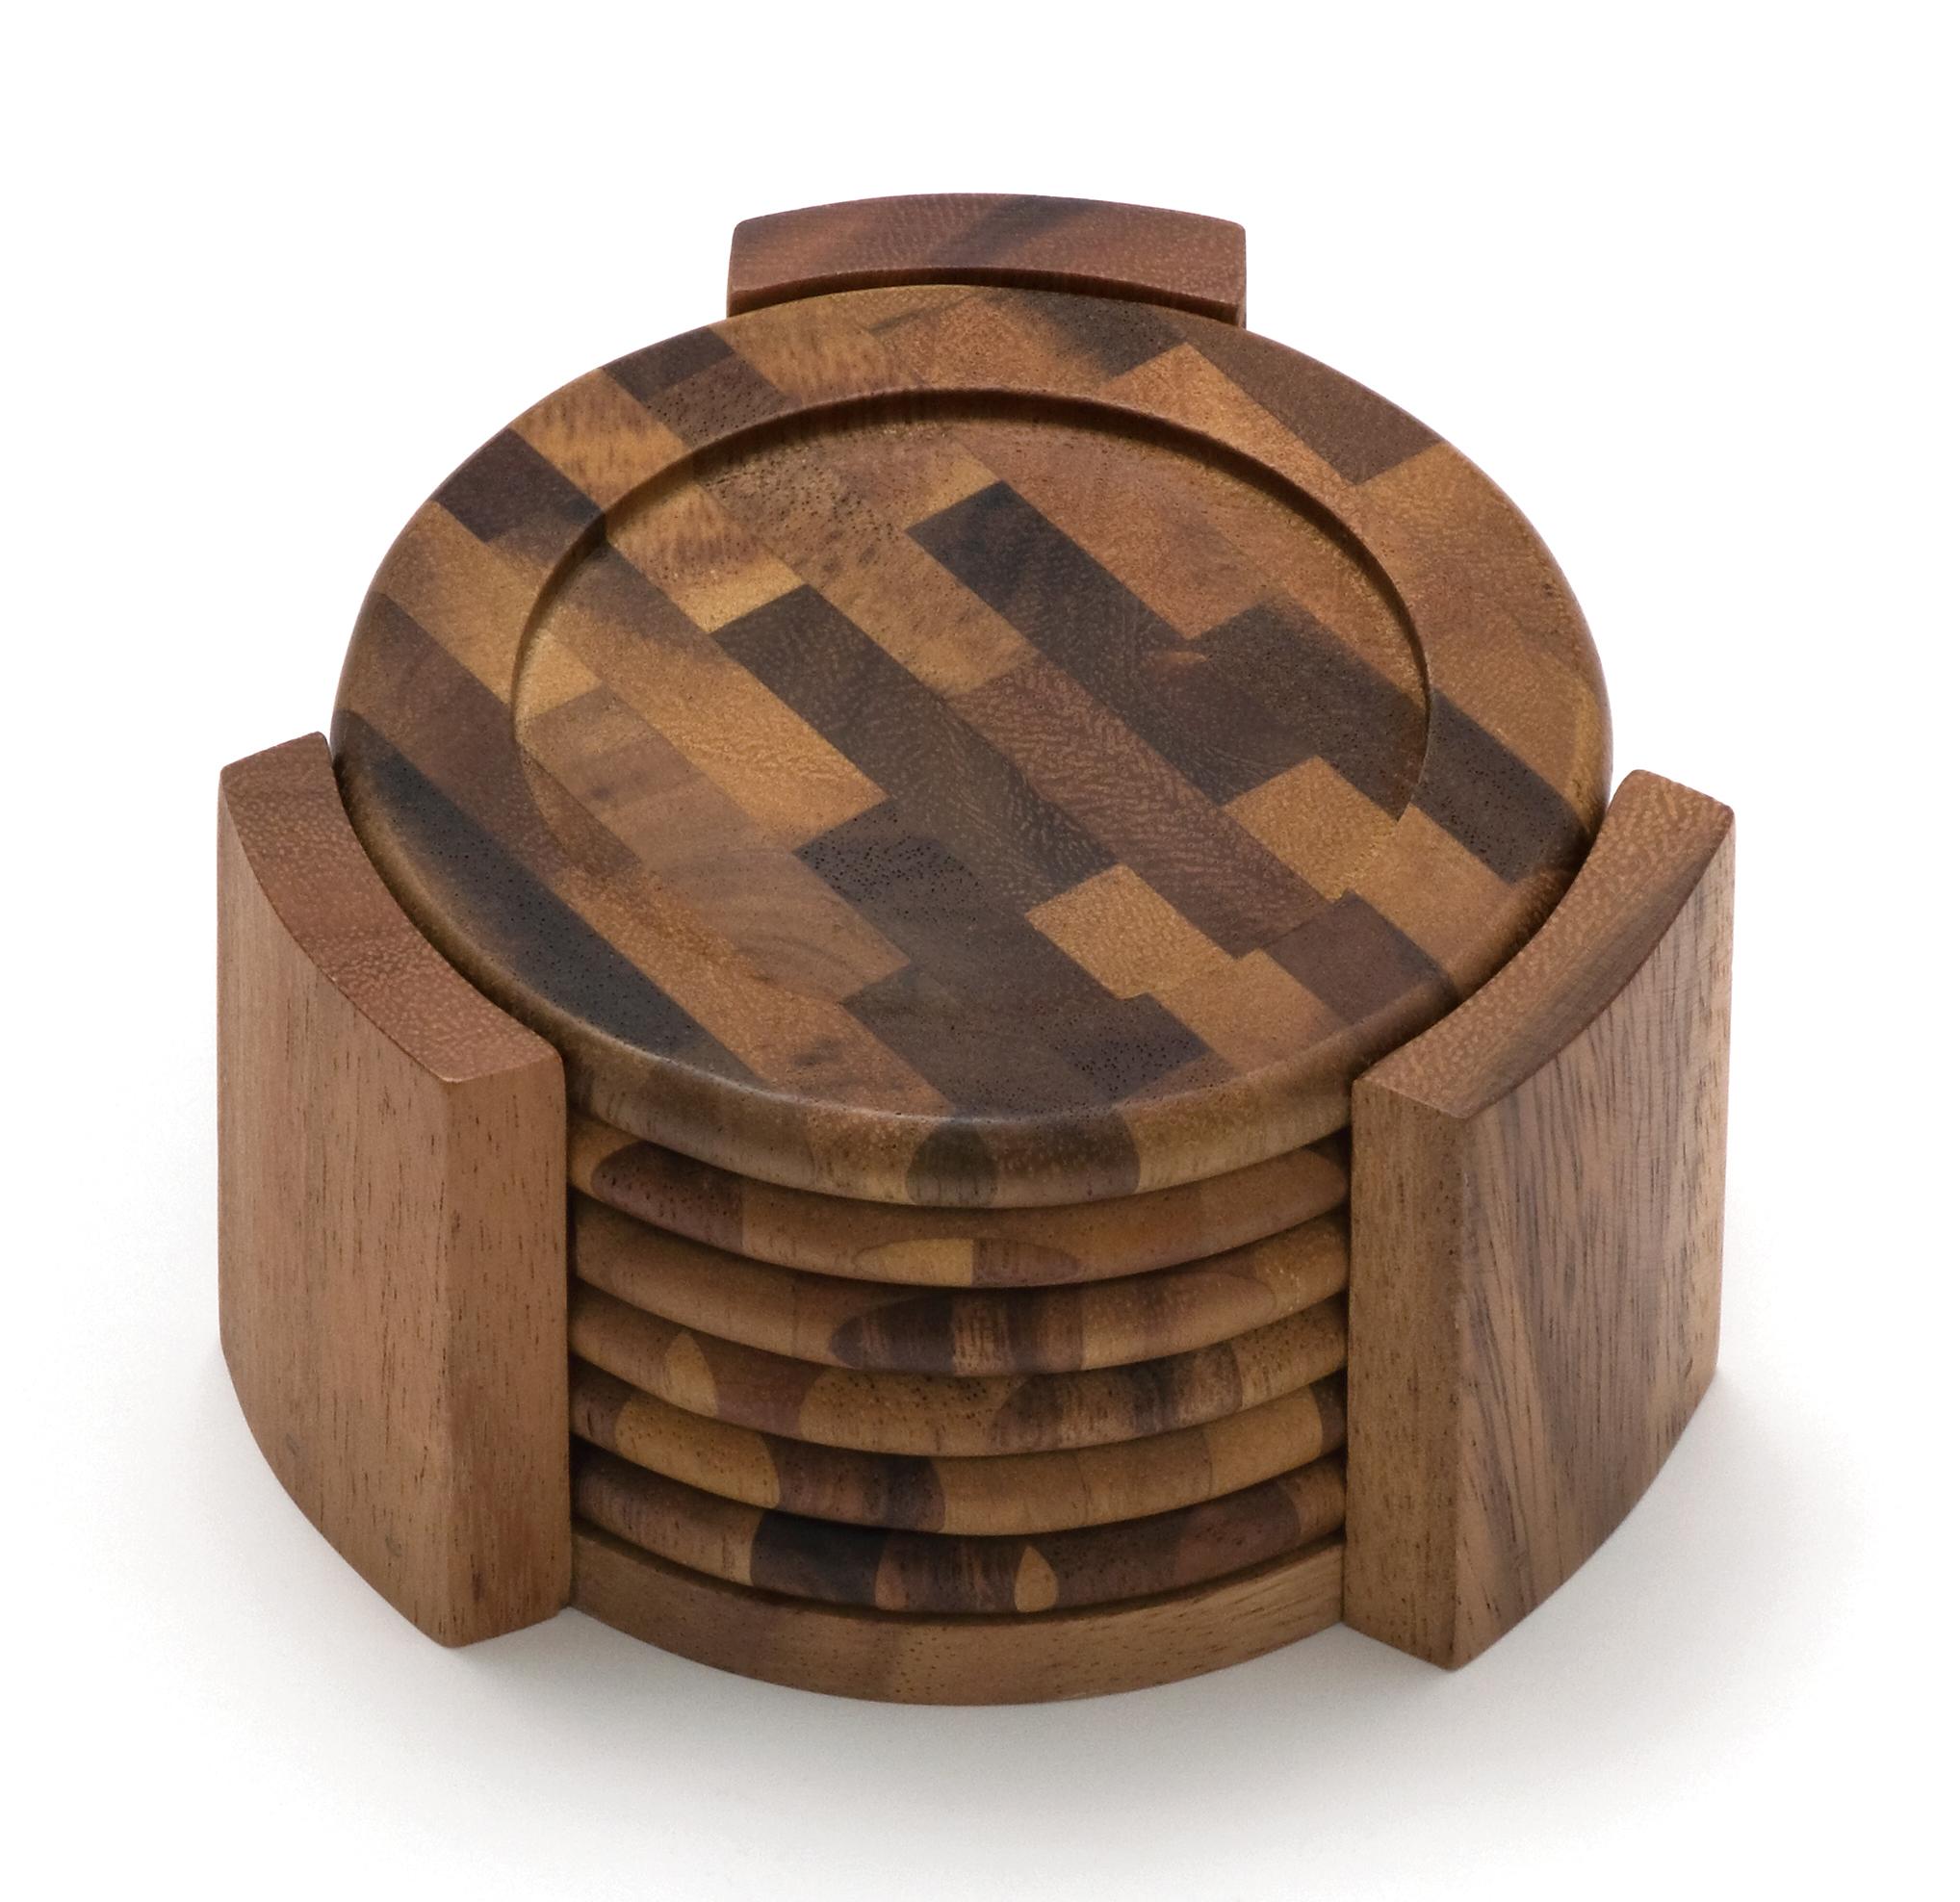 coaster sets  dining  entertaining  lipper international - acacia end grain coaster set piece set